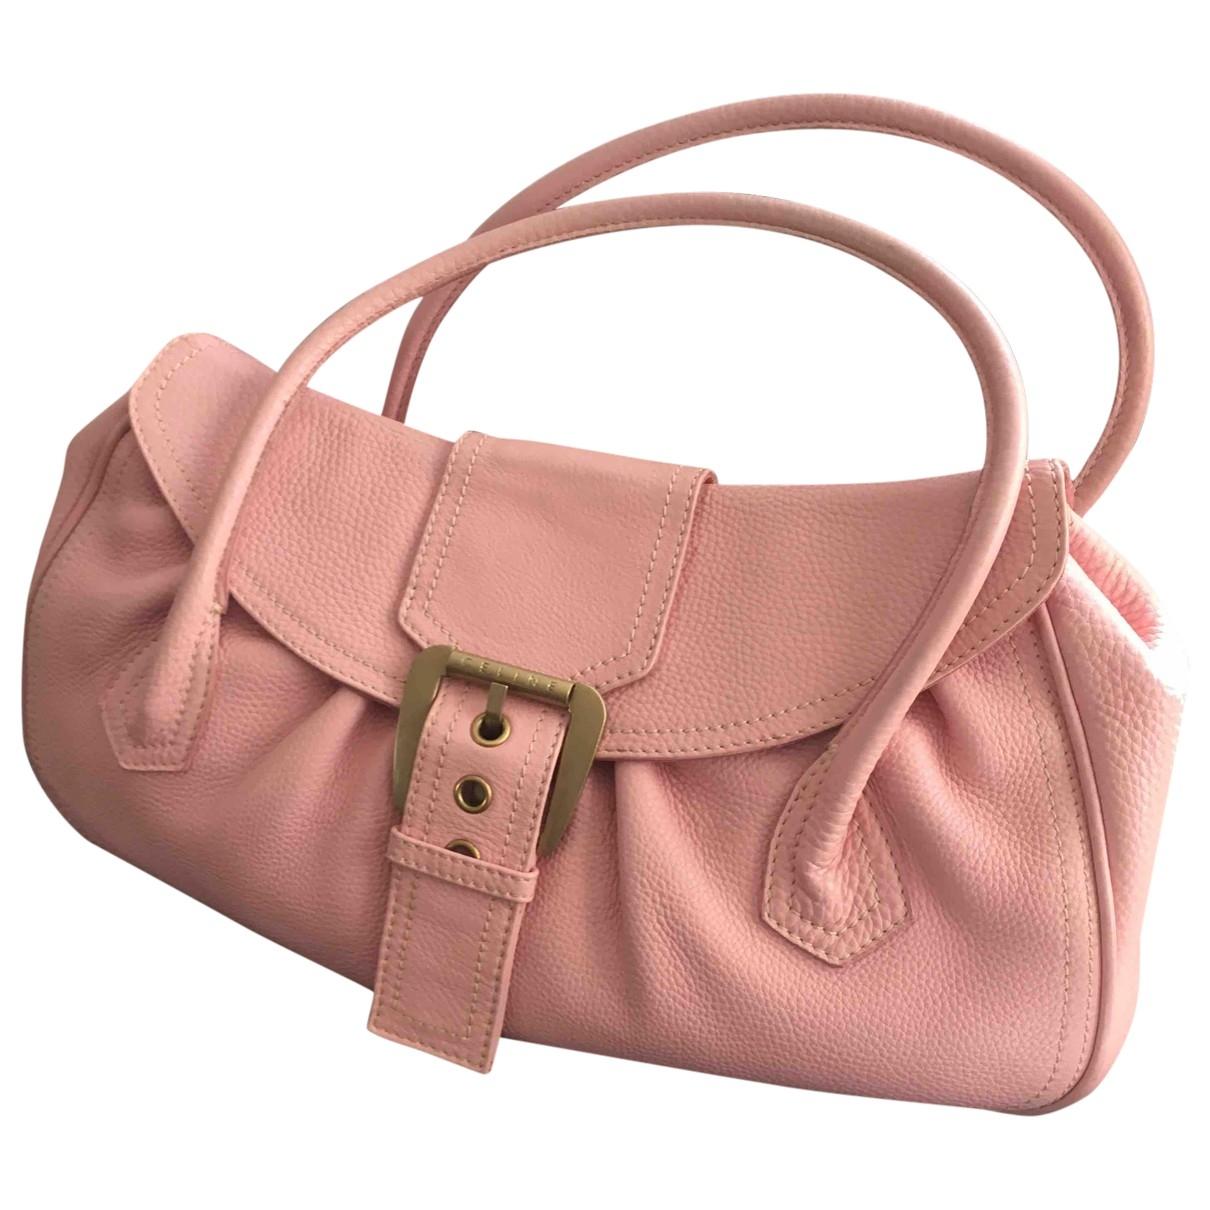 Celine \N Pink Leather handbag for Women \N